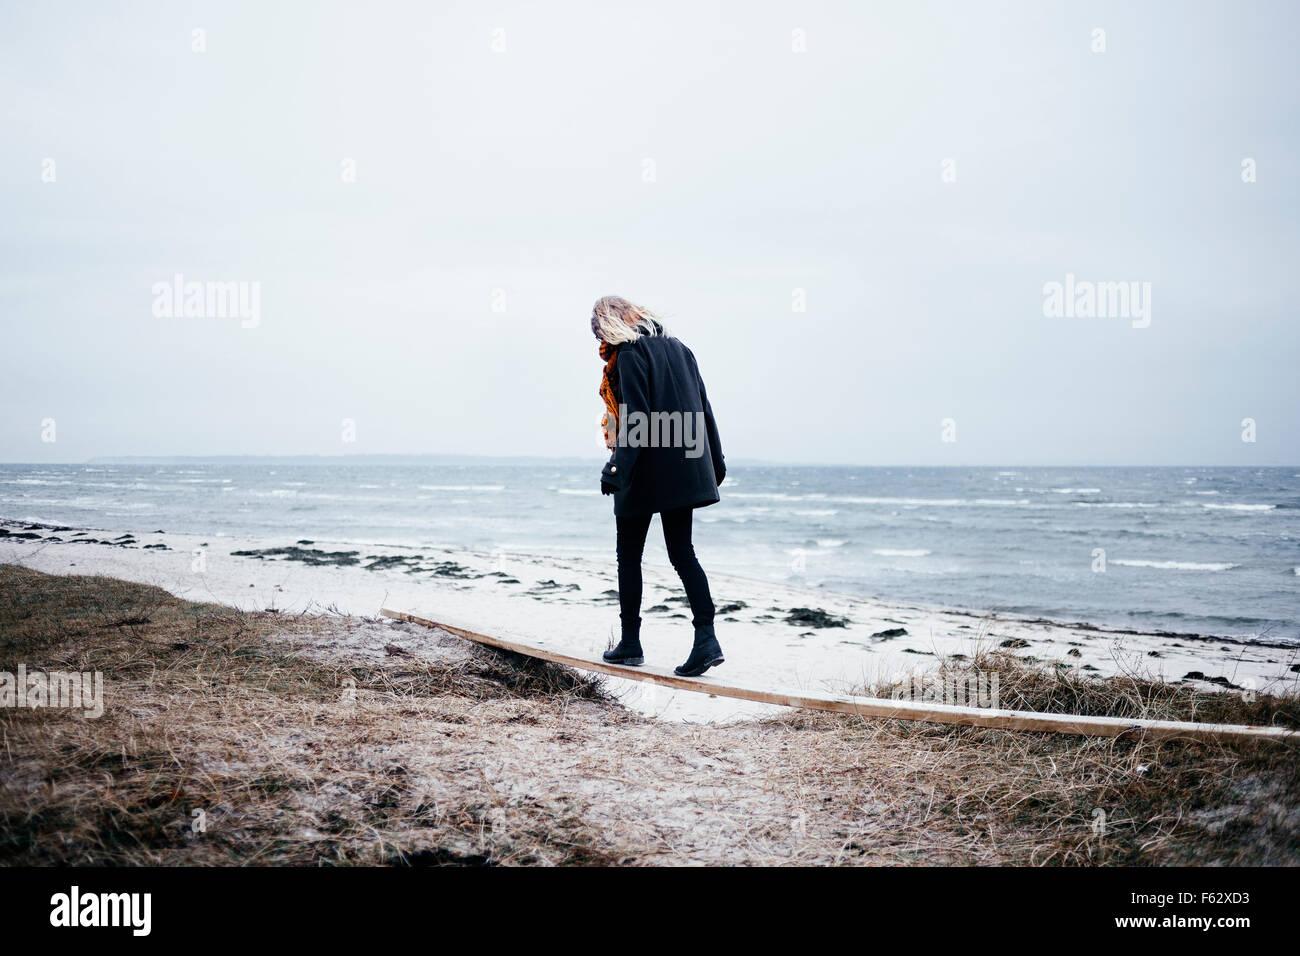 Voller Länge Rückansicht der jungen Frau balancieren auf Holz am Strand Stockbild